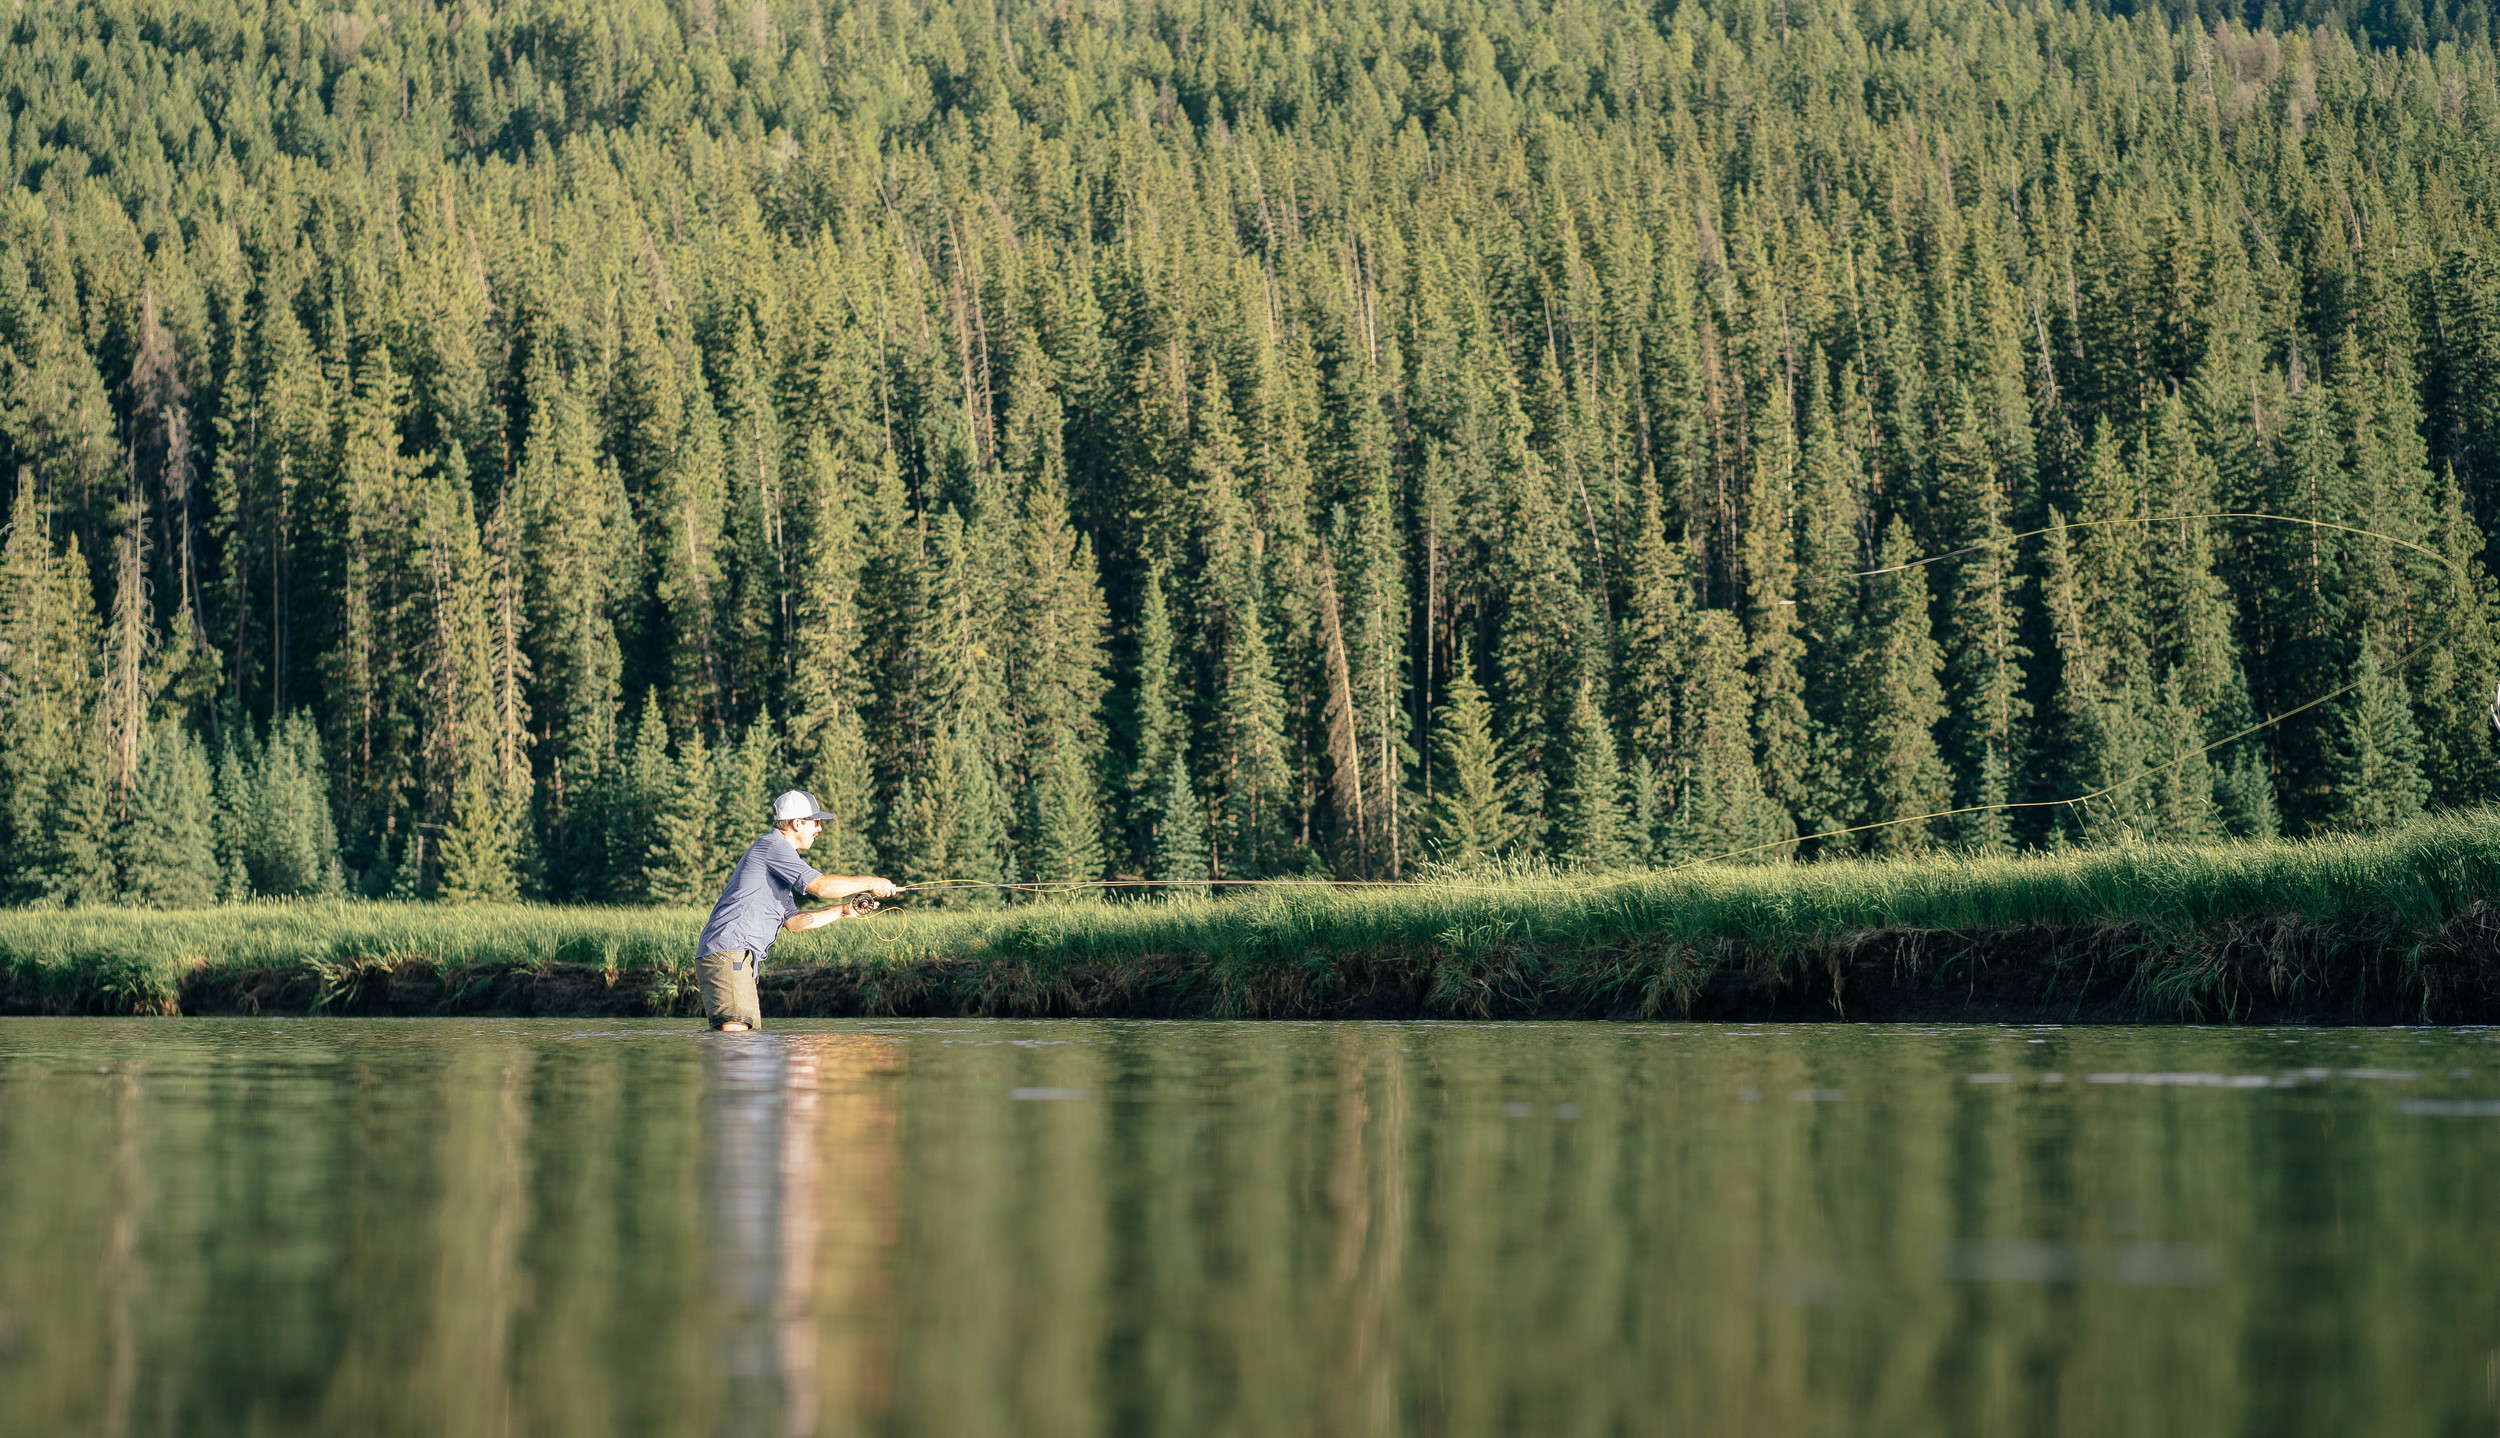 BaetisandStones-Yellowstone-Cutthroat-13.jpg